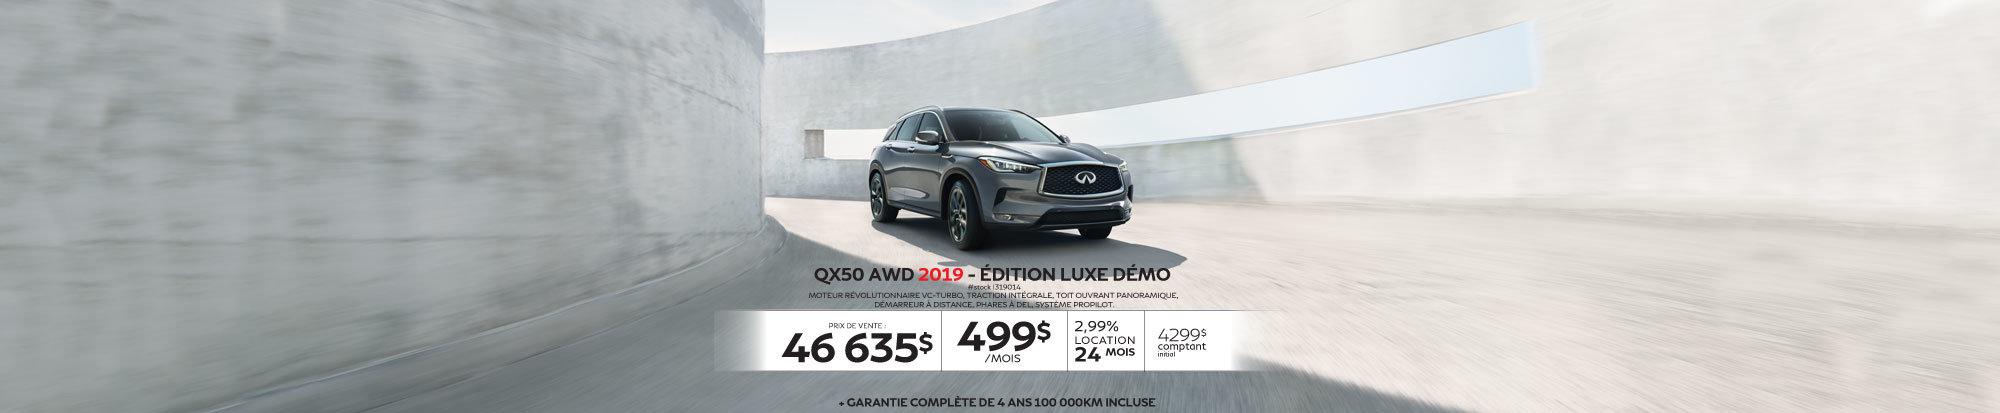 QX50 AWD 2019 édition LUXE Démo web